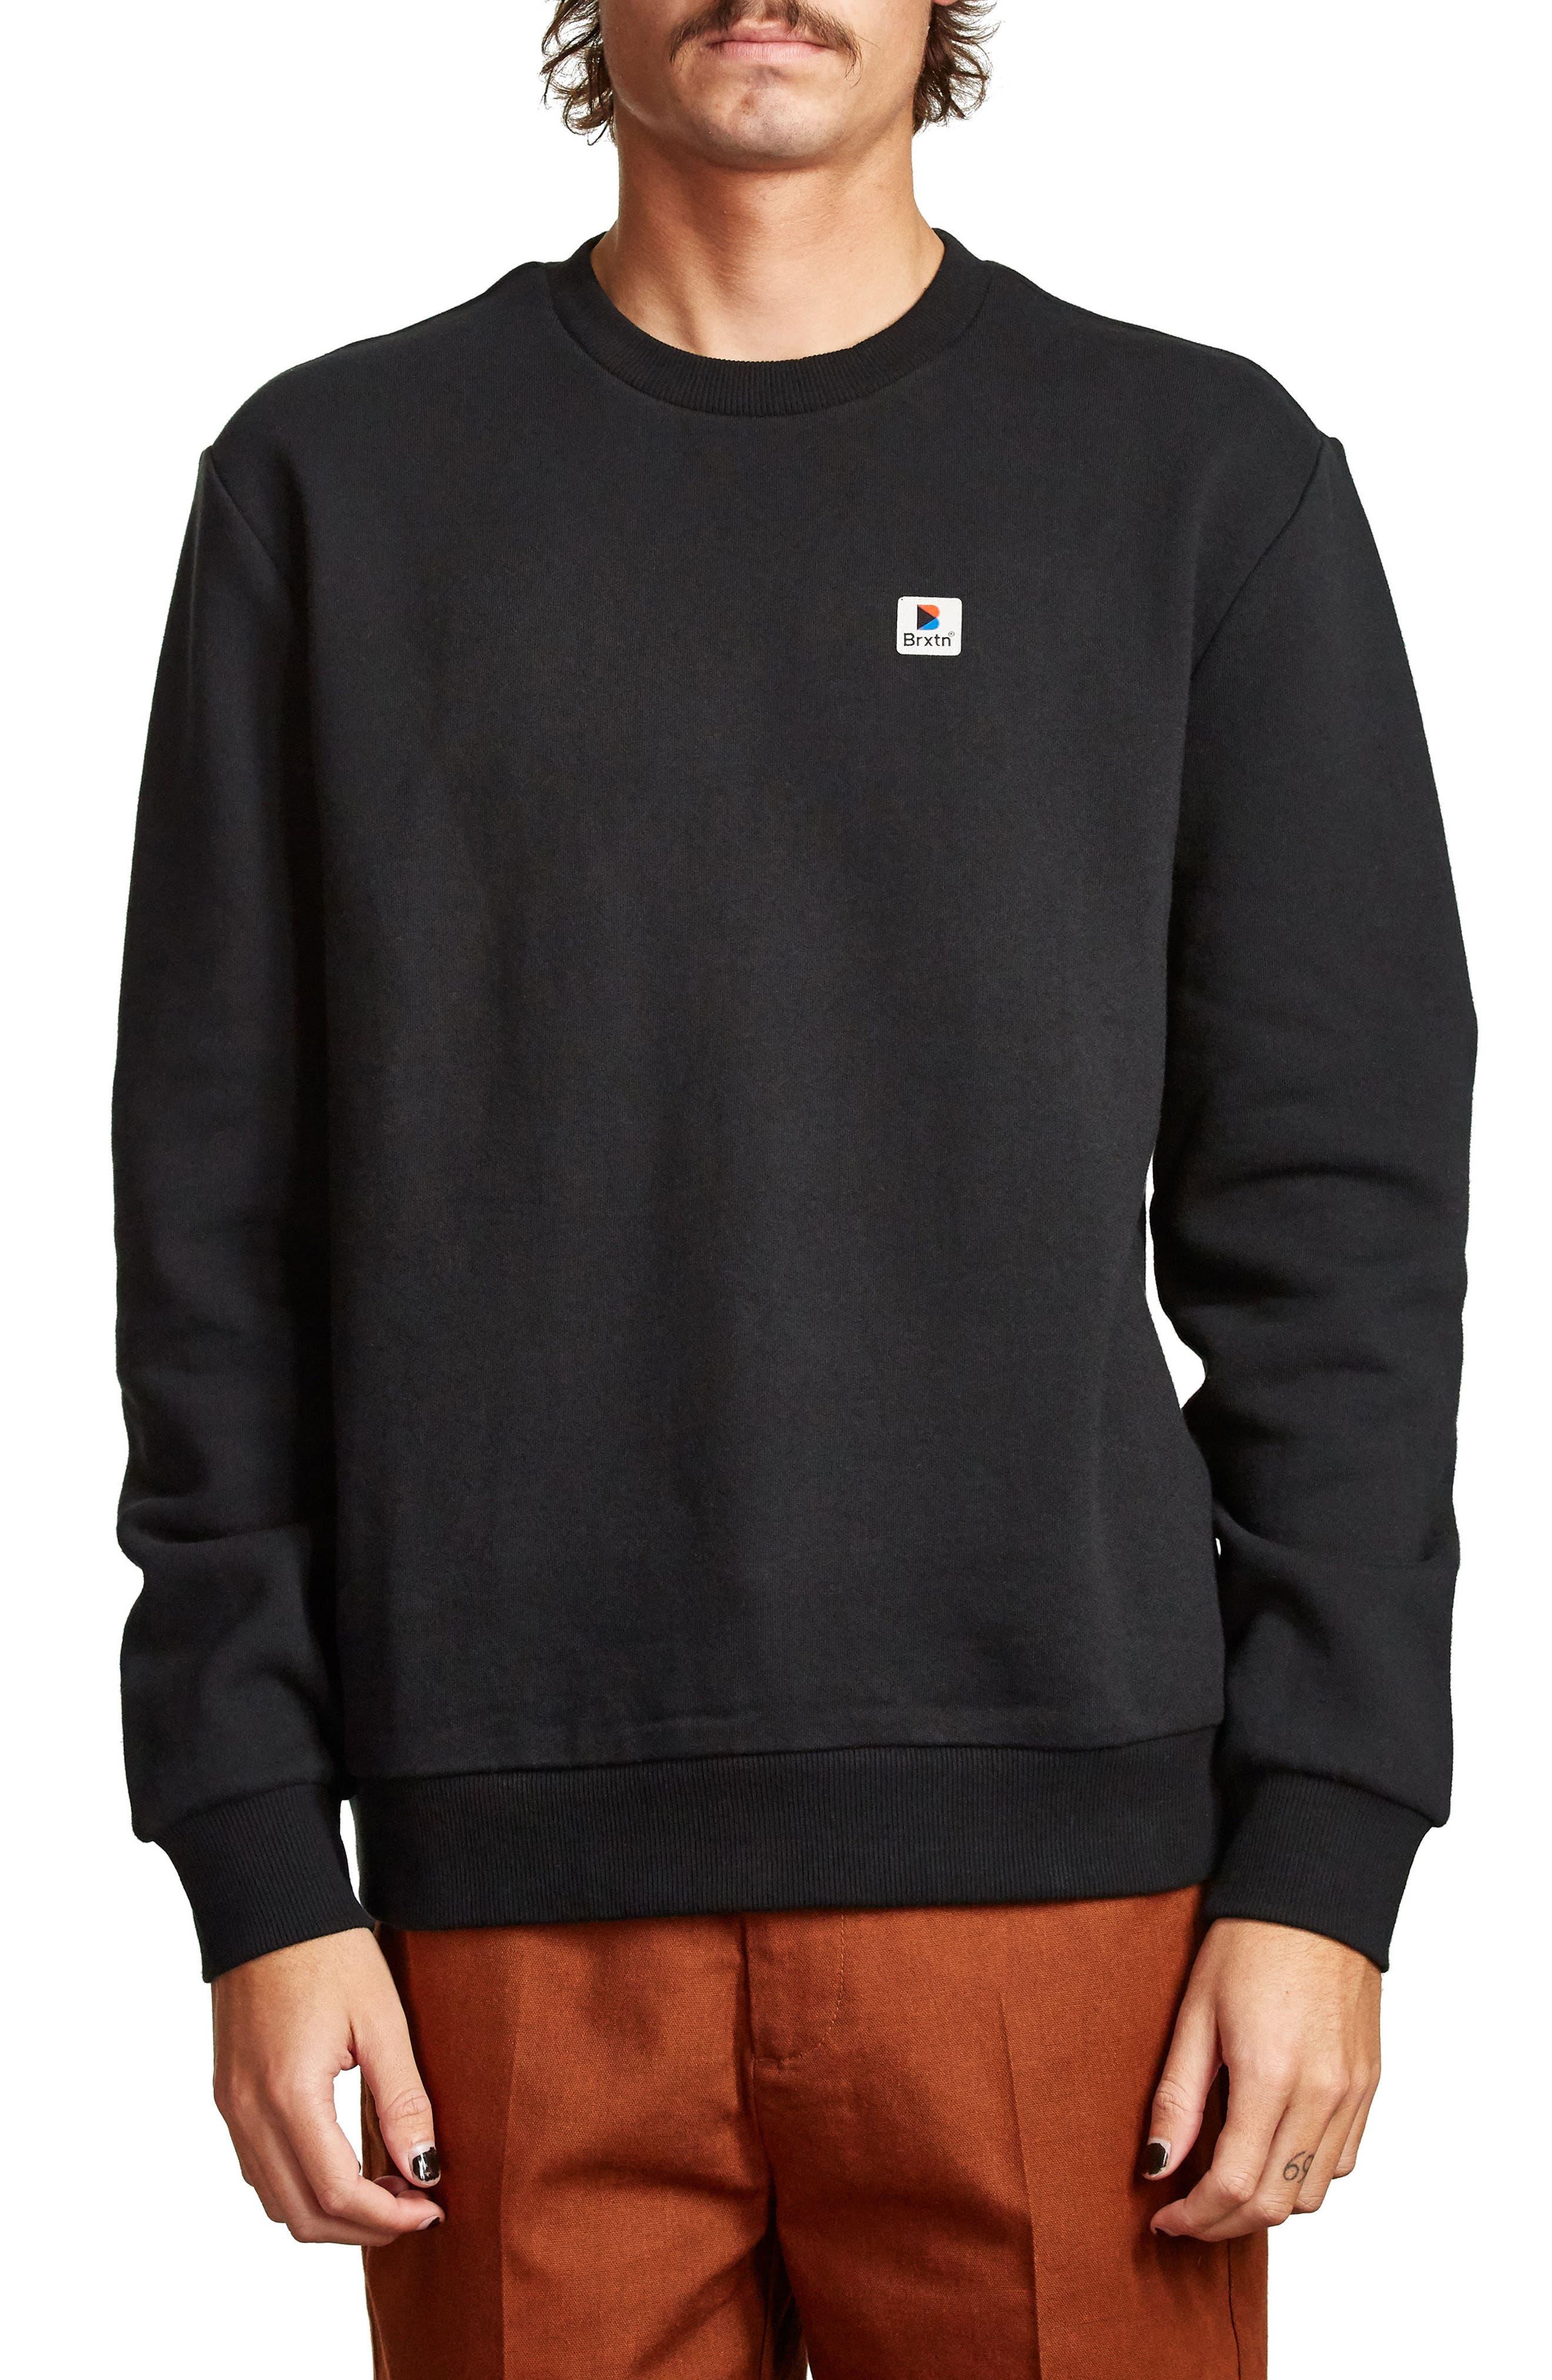 Stonewell Sweatshirt,                             Main thumbnail 1, color,                             Black